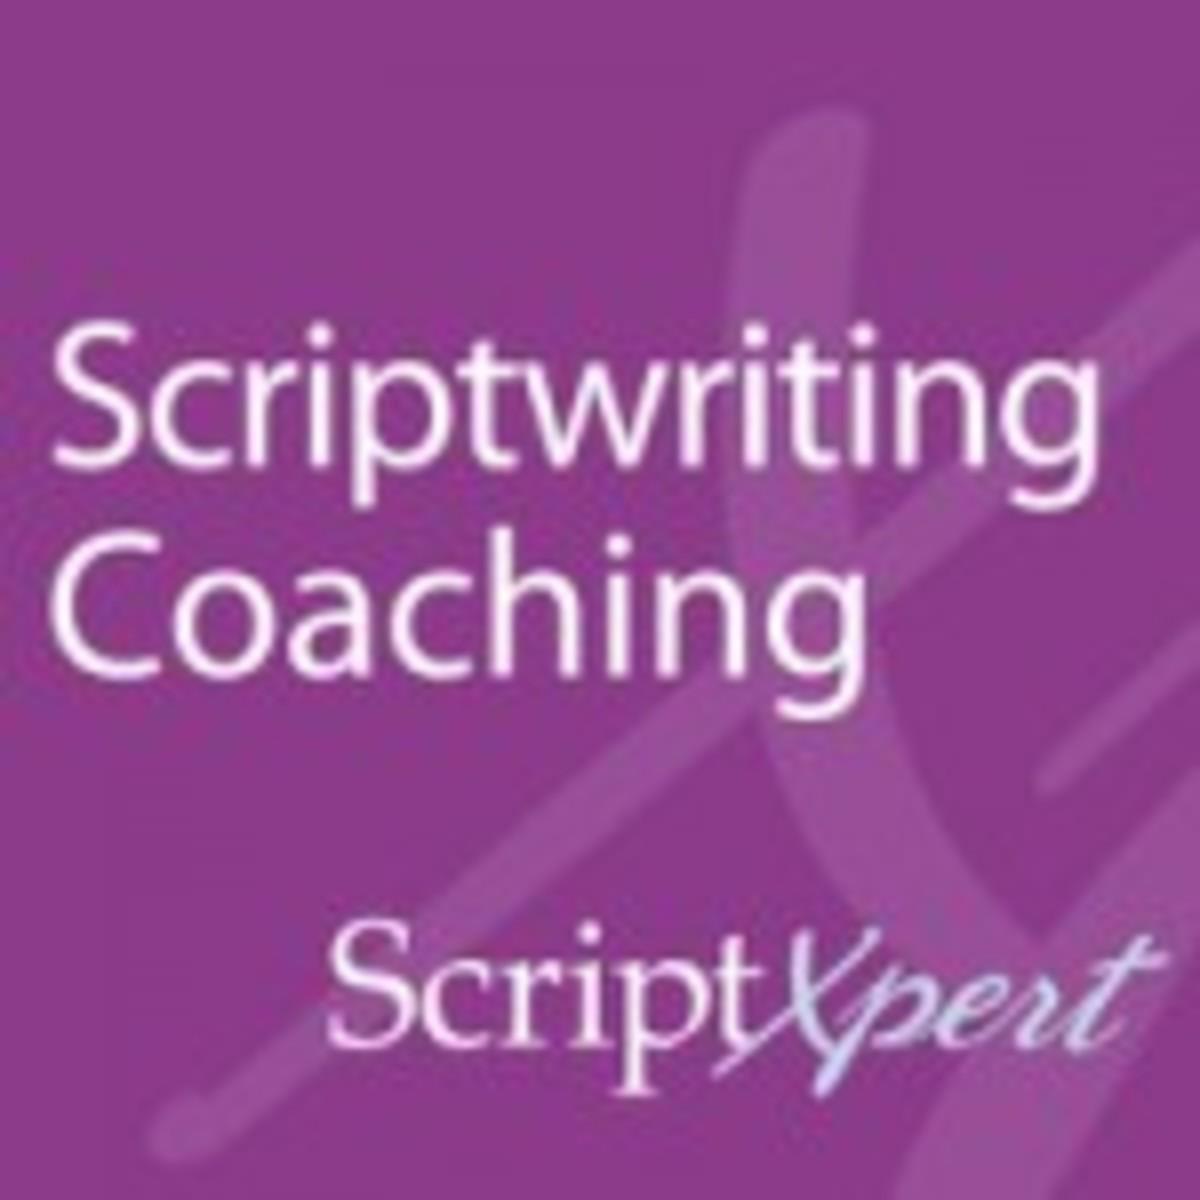 scriptxpert-scriptwriting-coaching_small